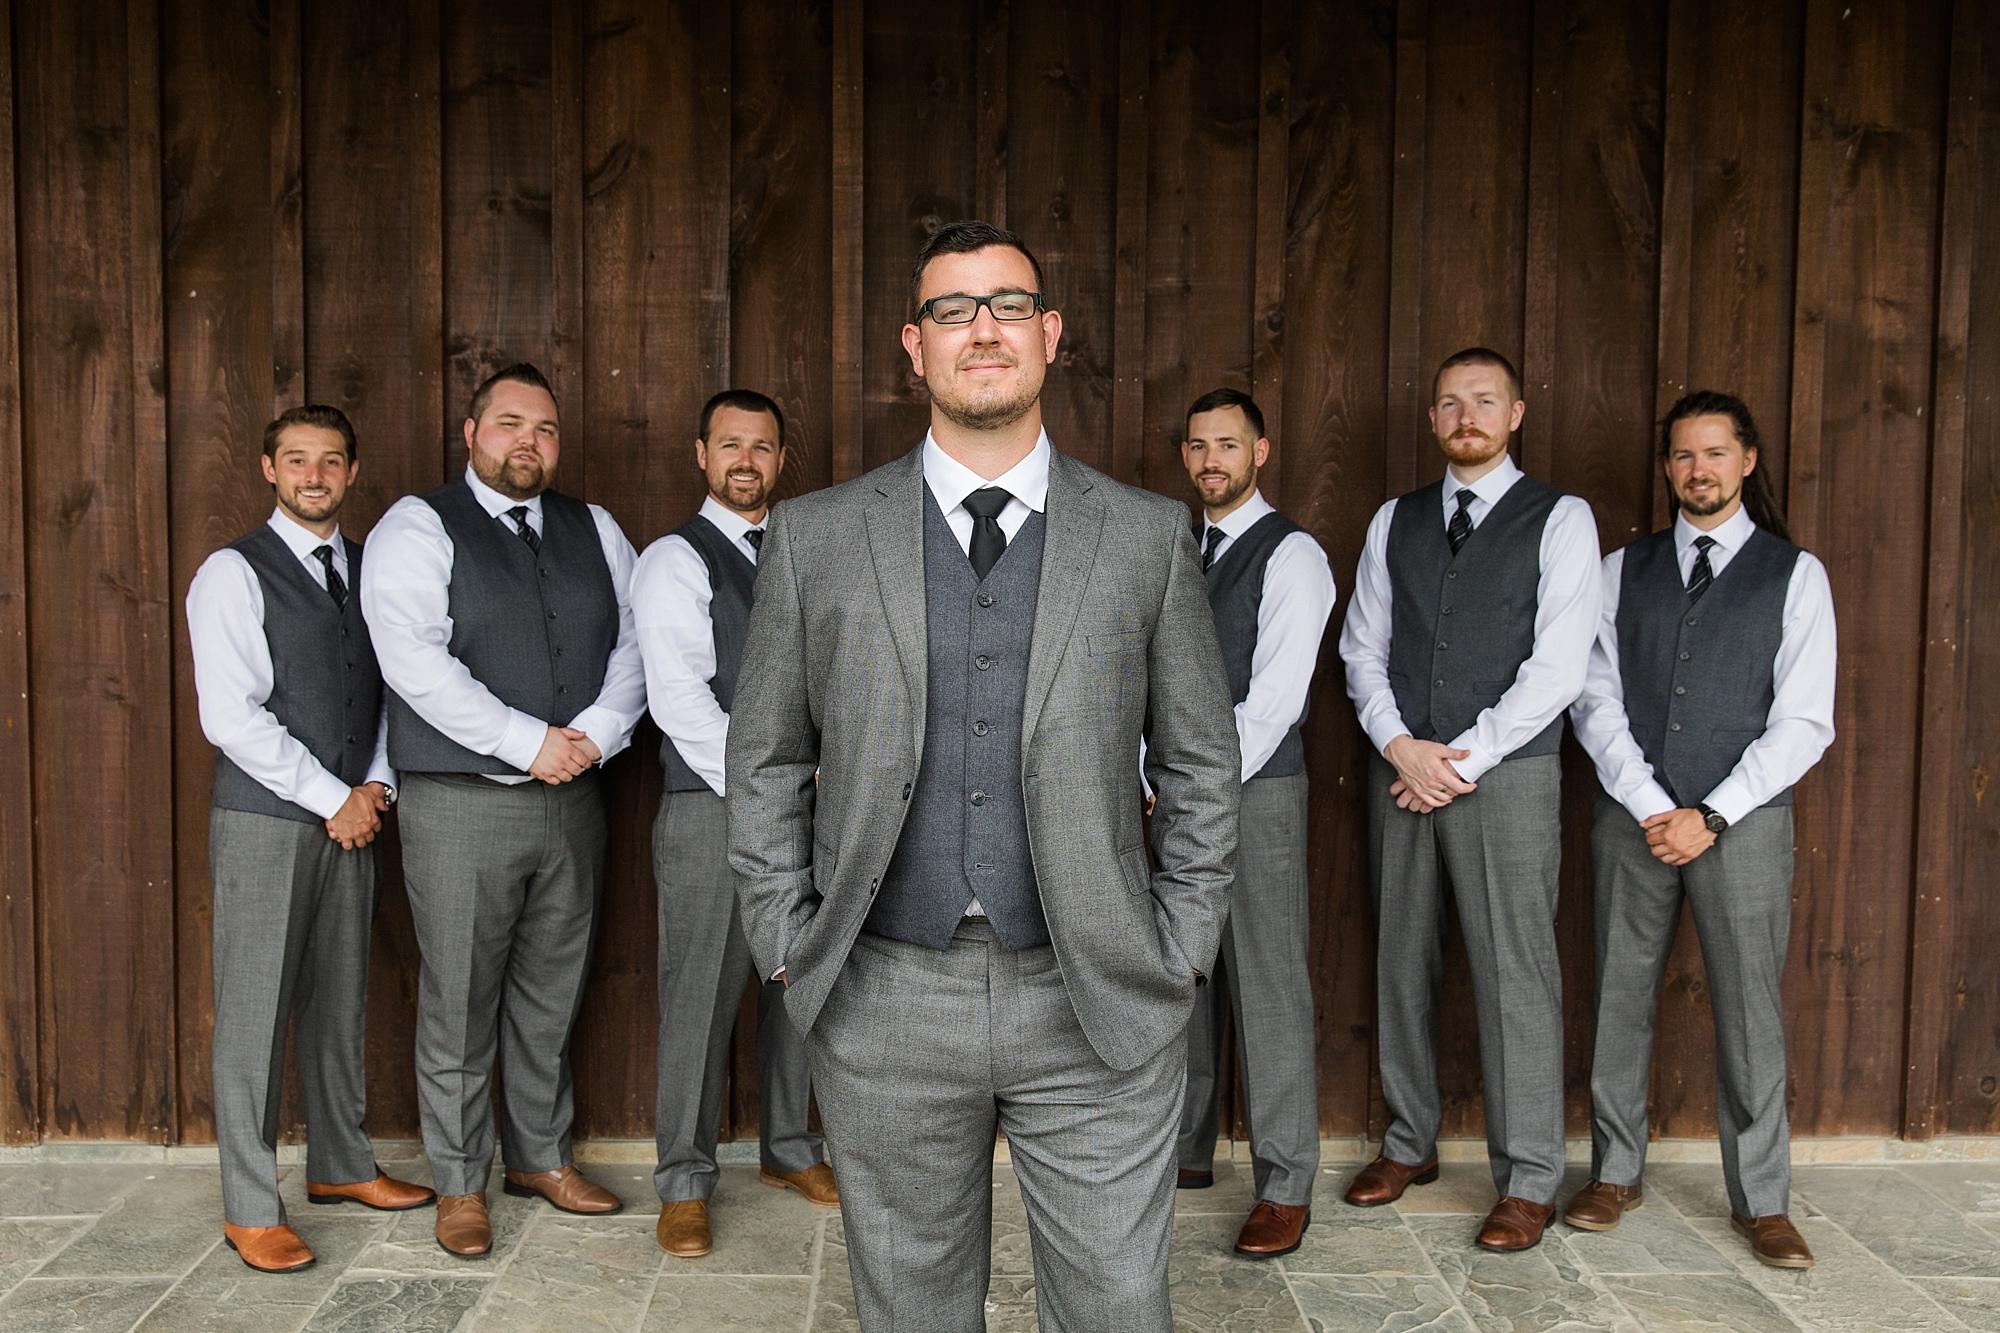 lipapark-hernderwinery-wedding_0028.jpg